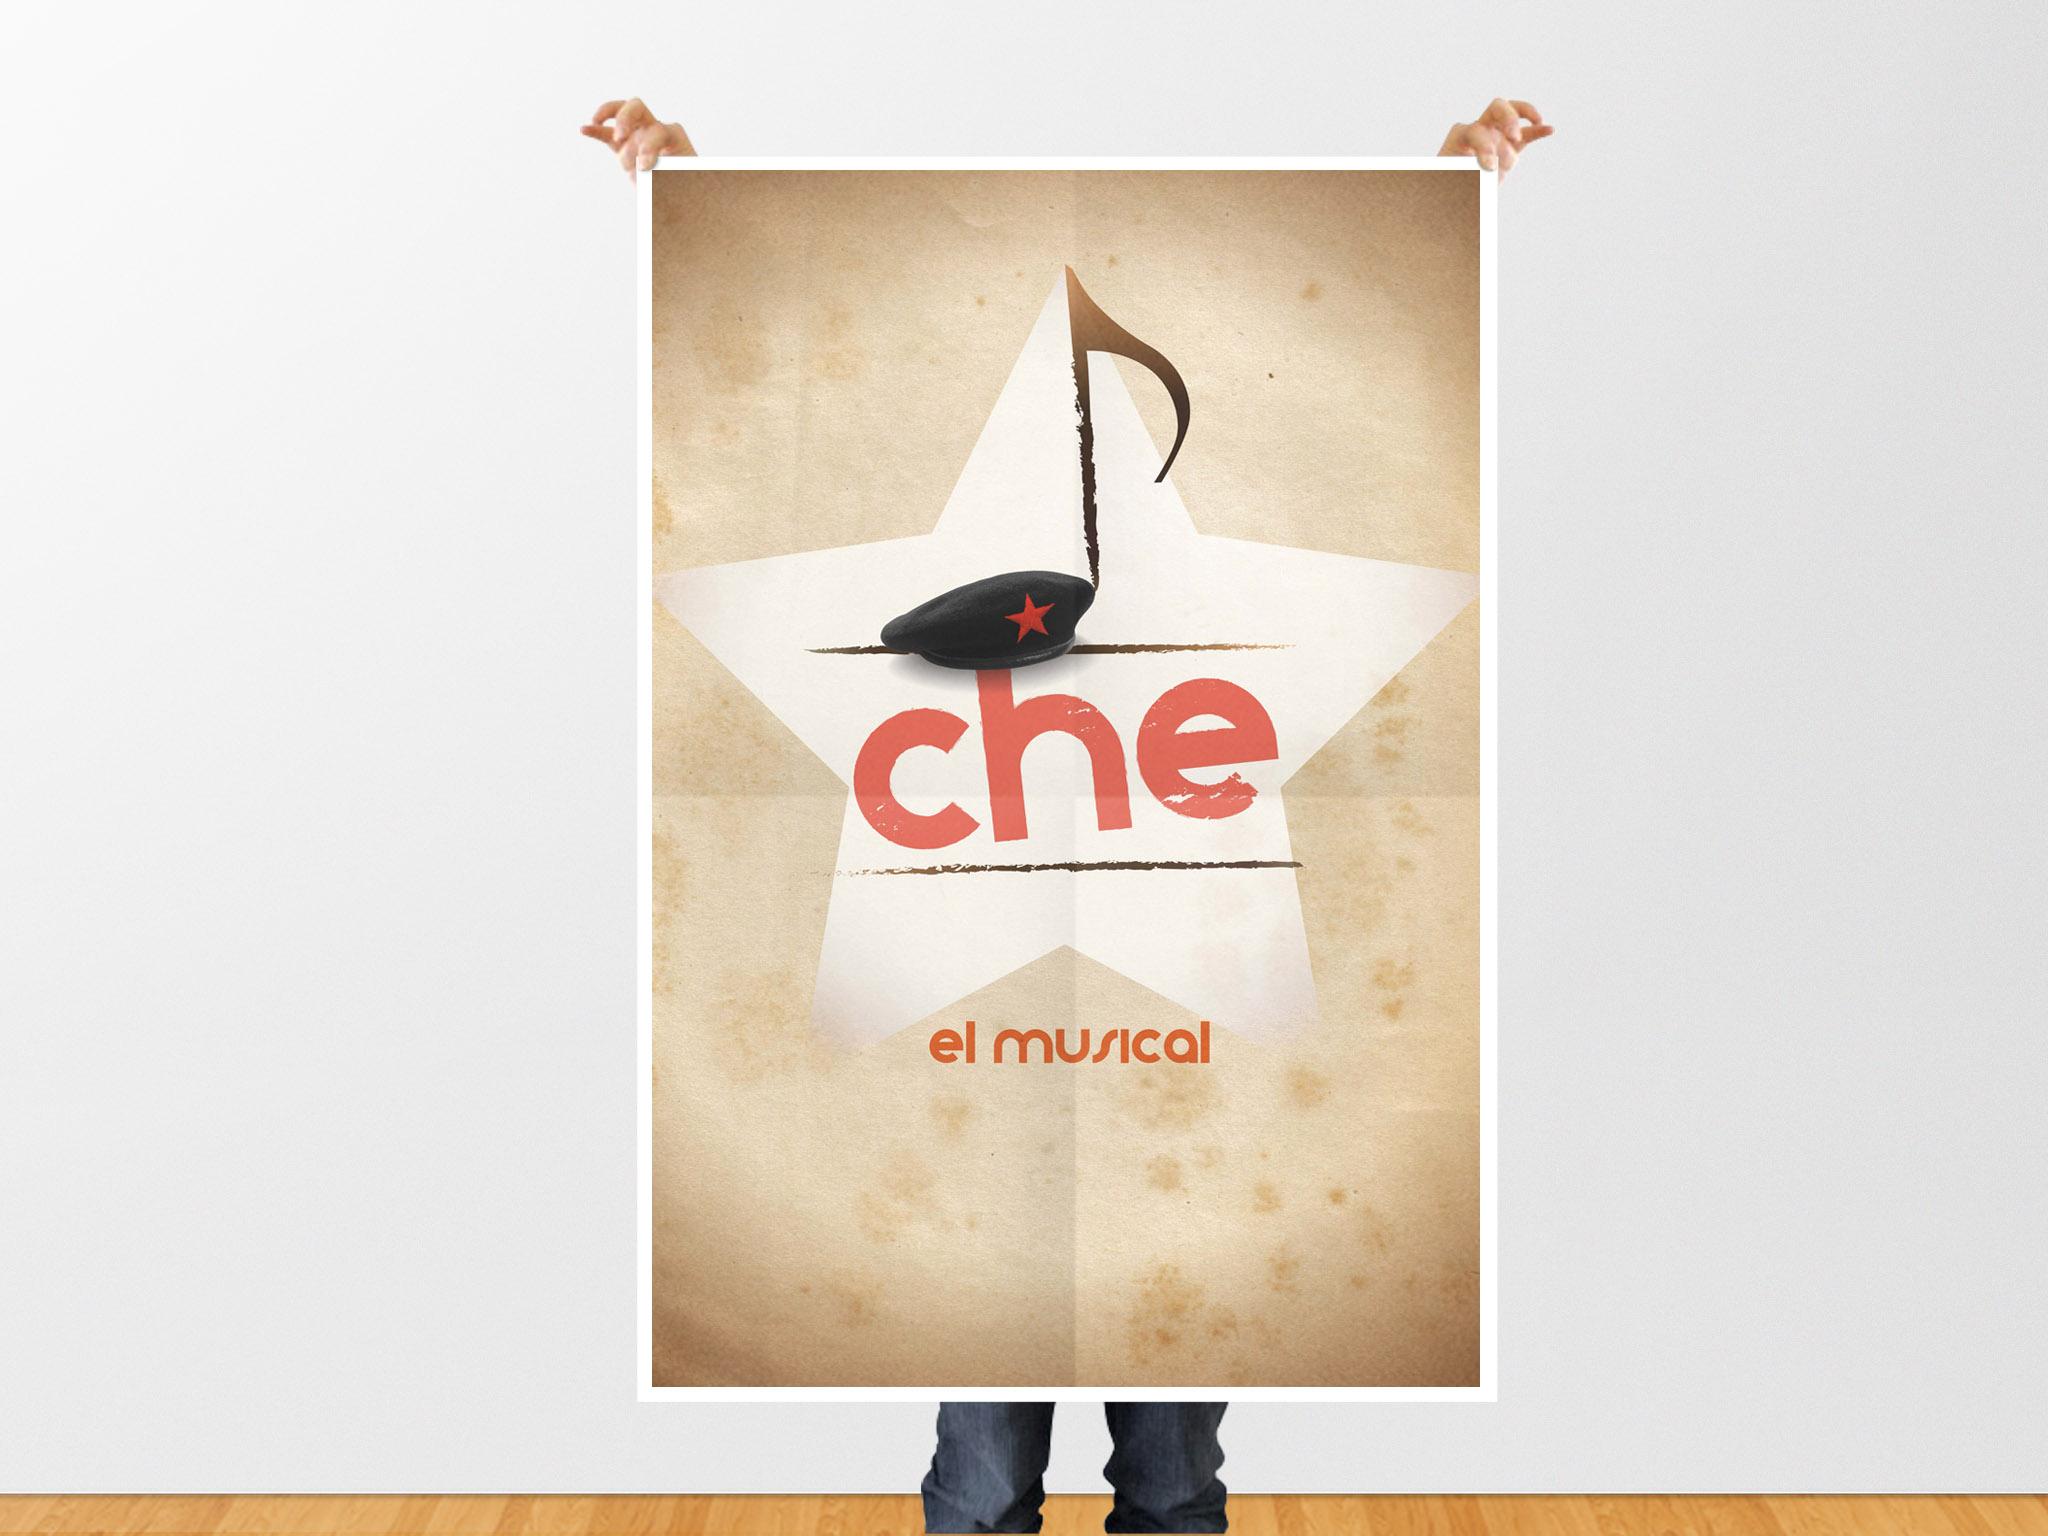 Musical CHE cartel@2x